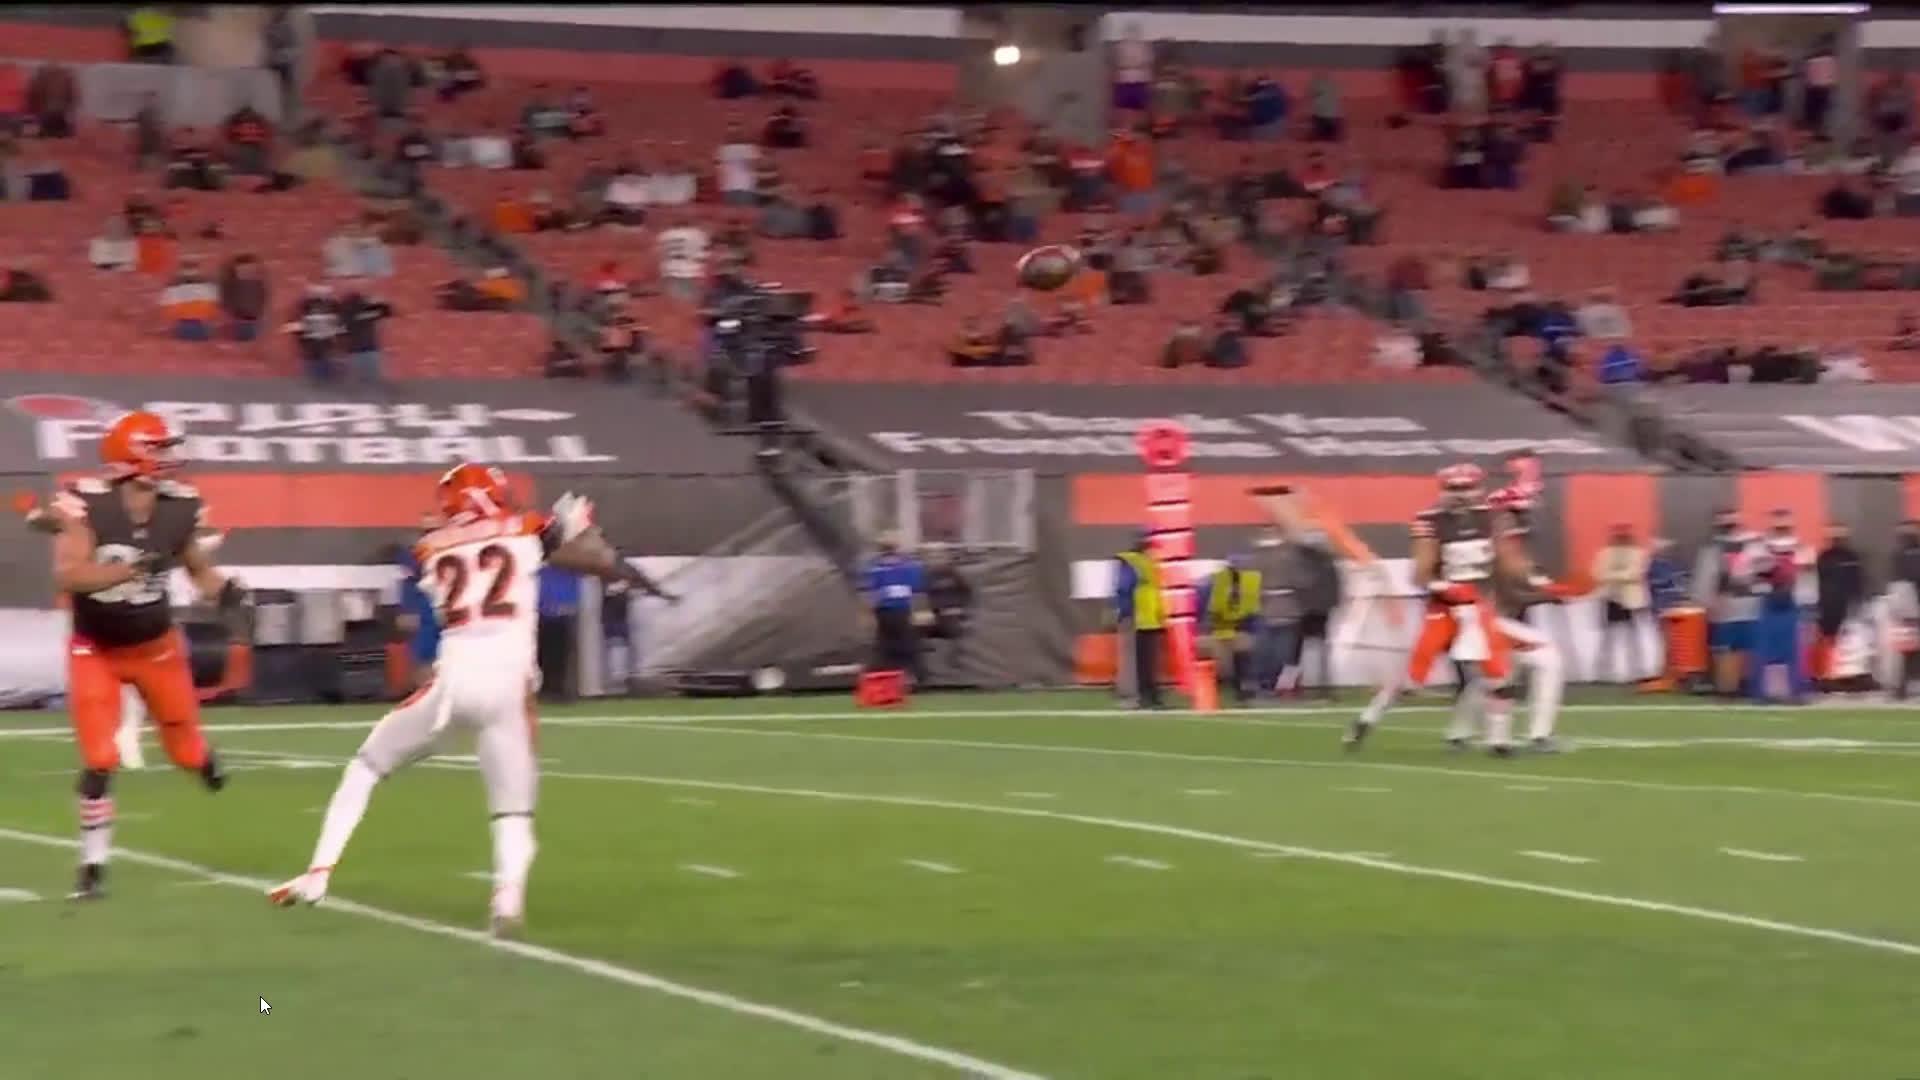 [Highlight] Jackson intercepts it